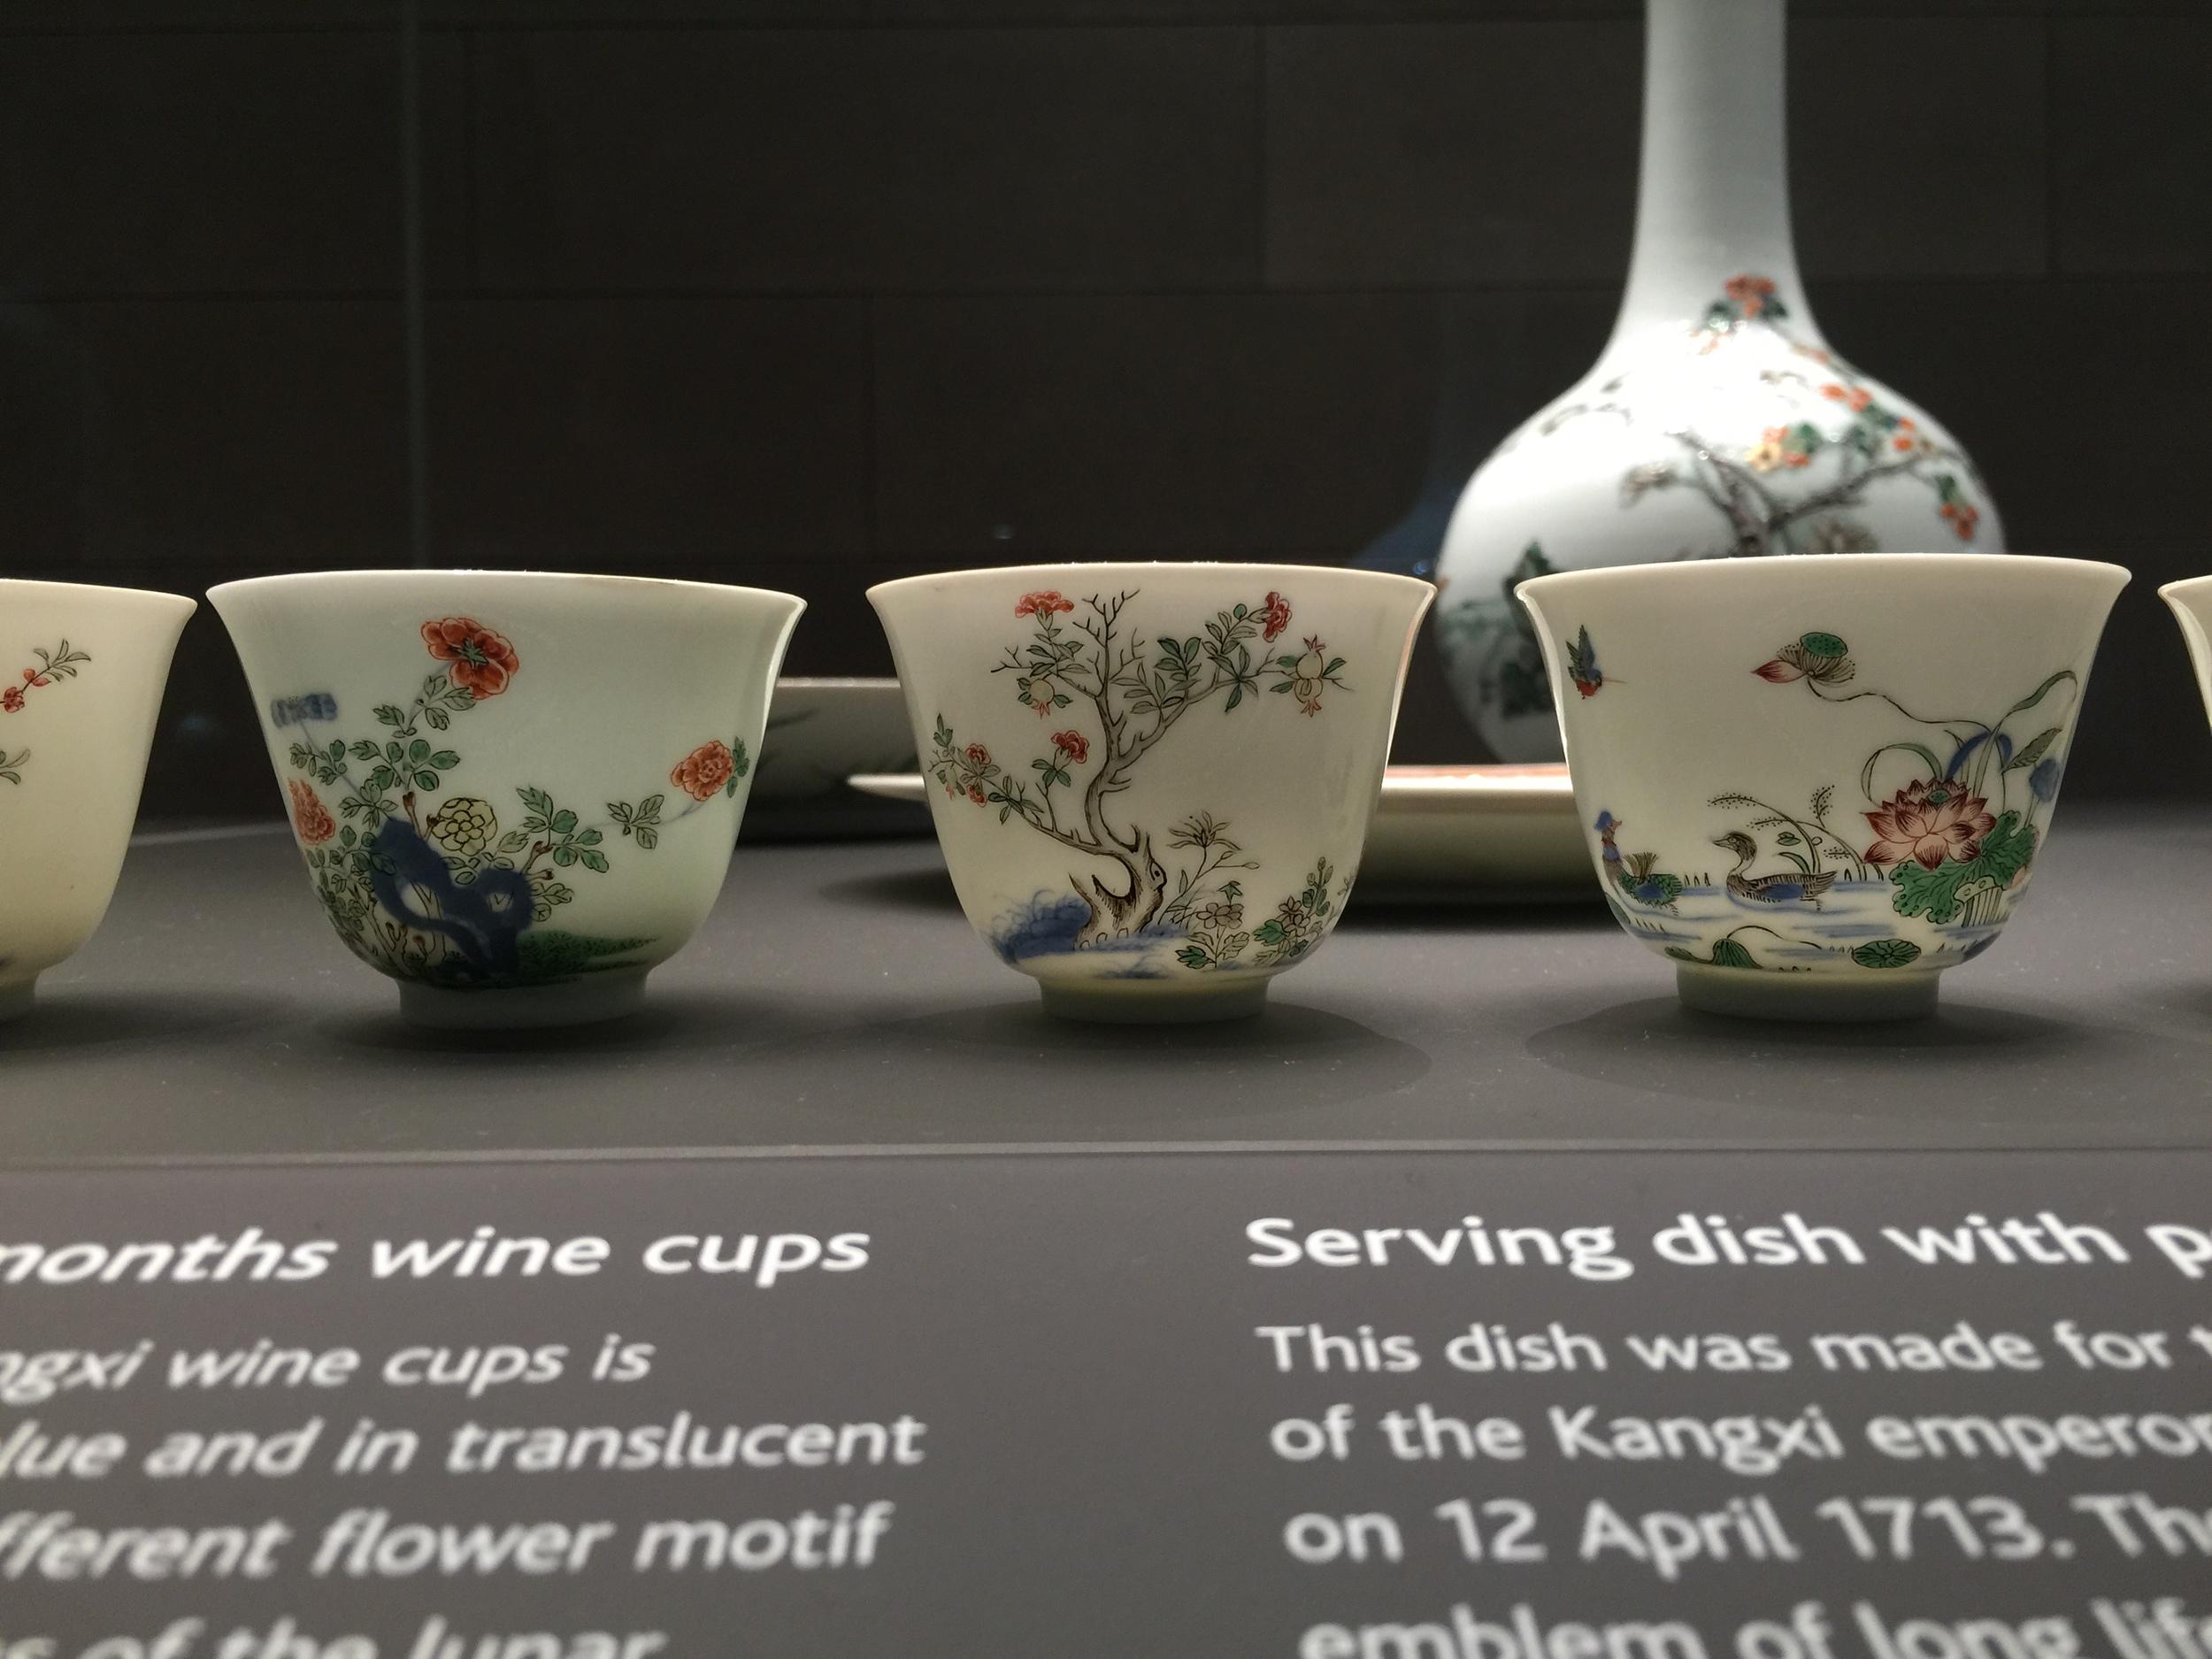 Chinese-Porcelain-British-Museum-Percival-David-jessewaugh.com-127.jpg